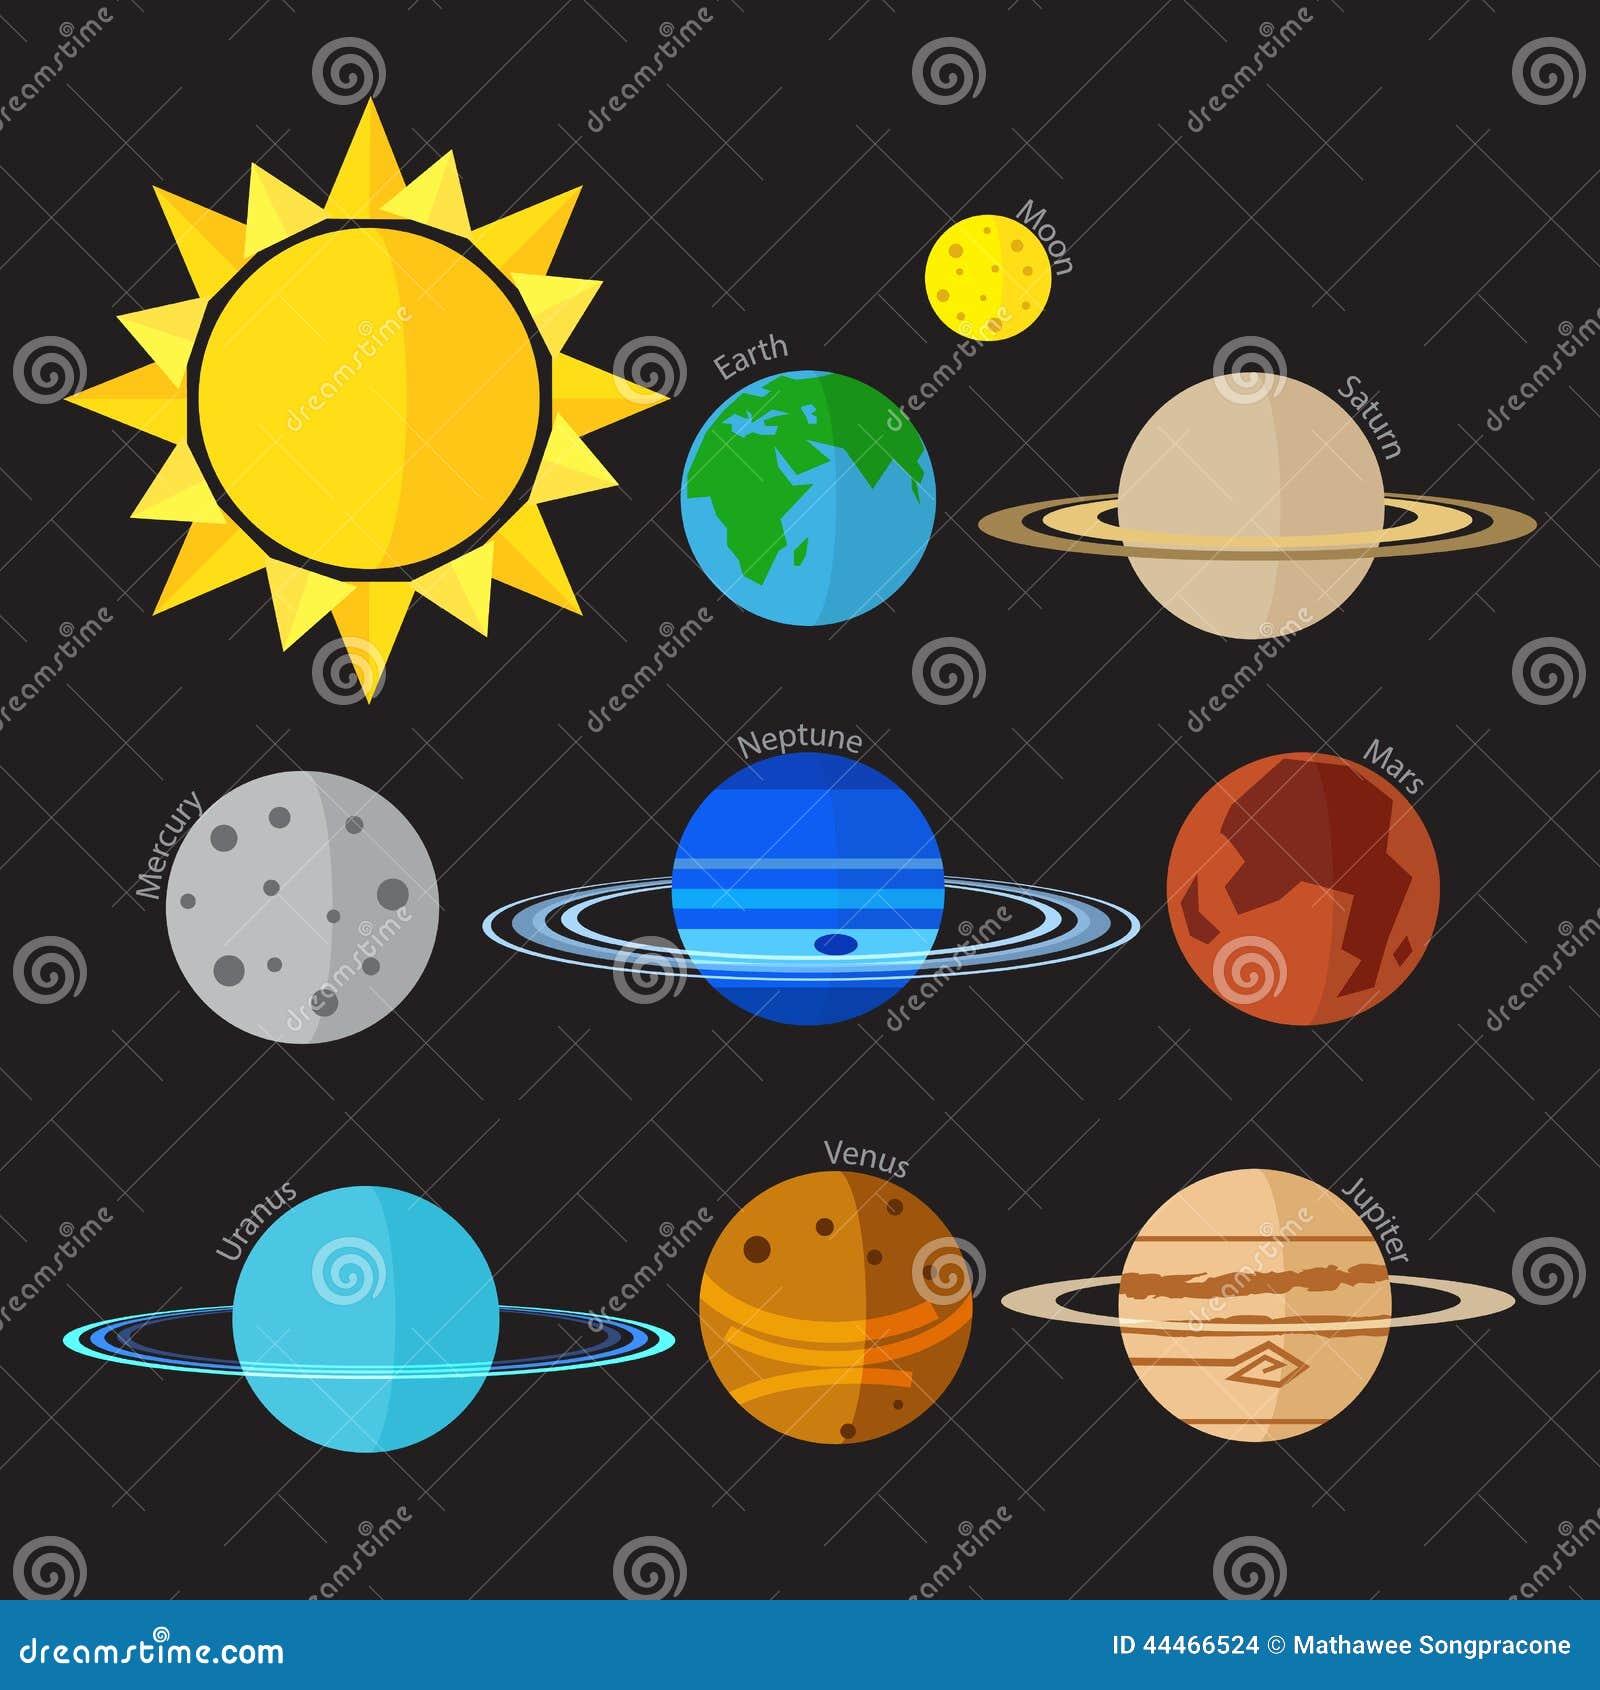 solar system vector - photo #22